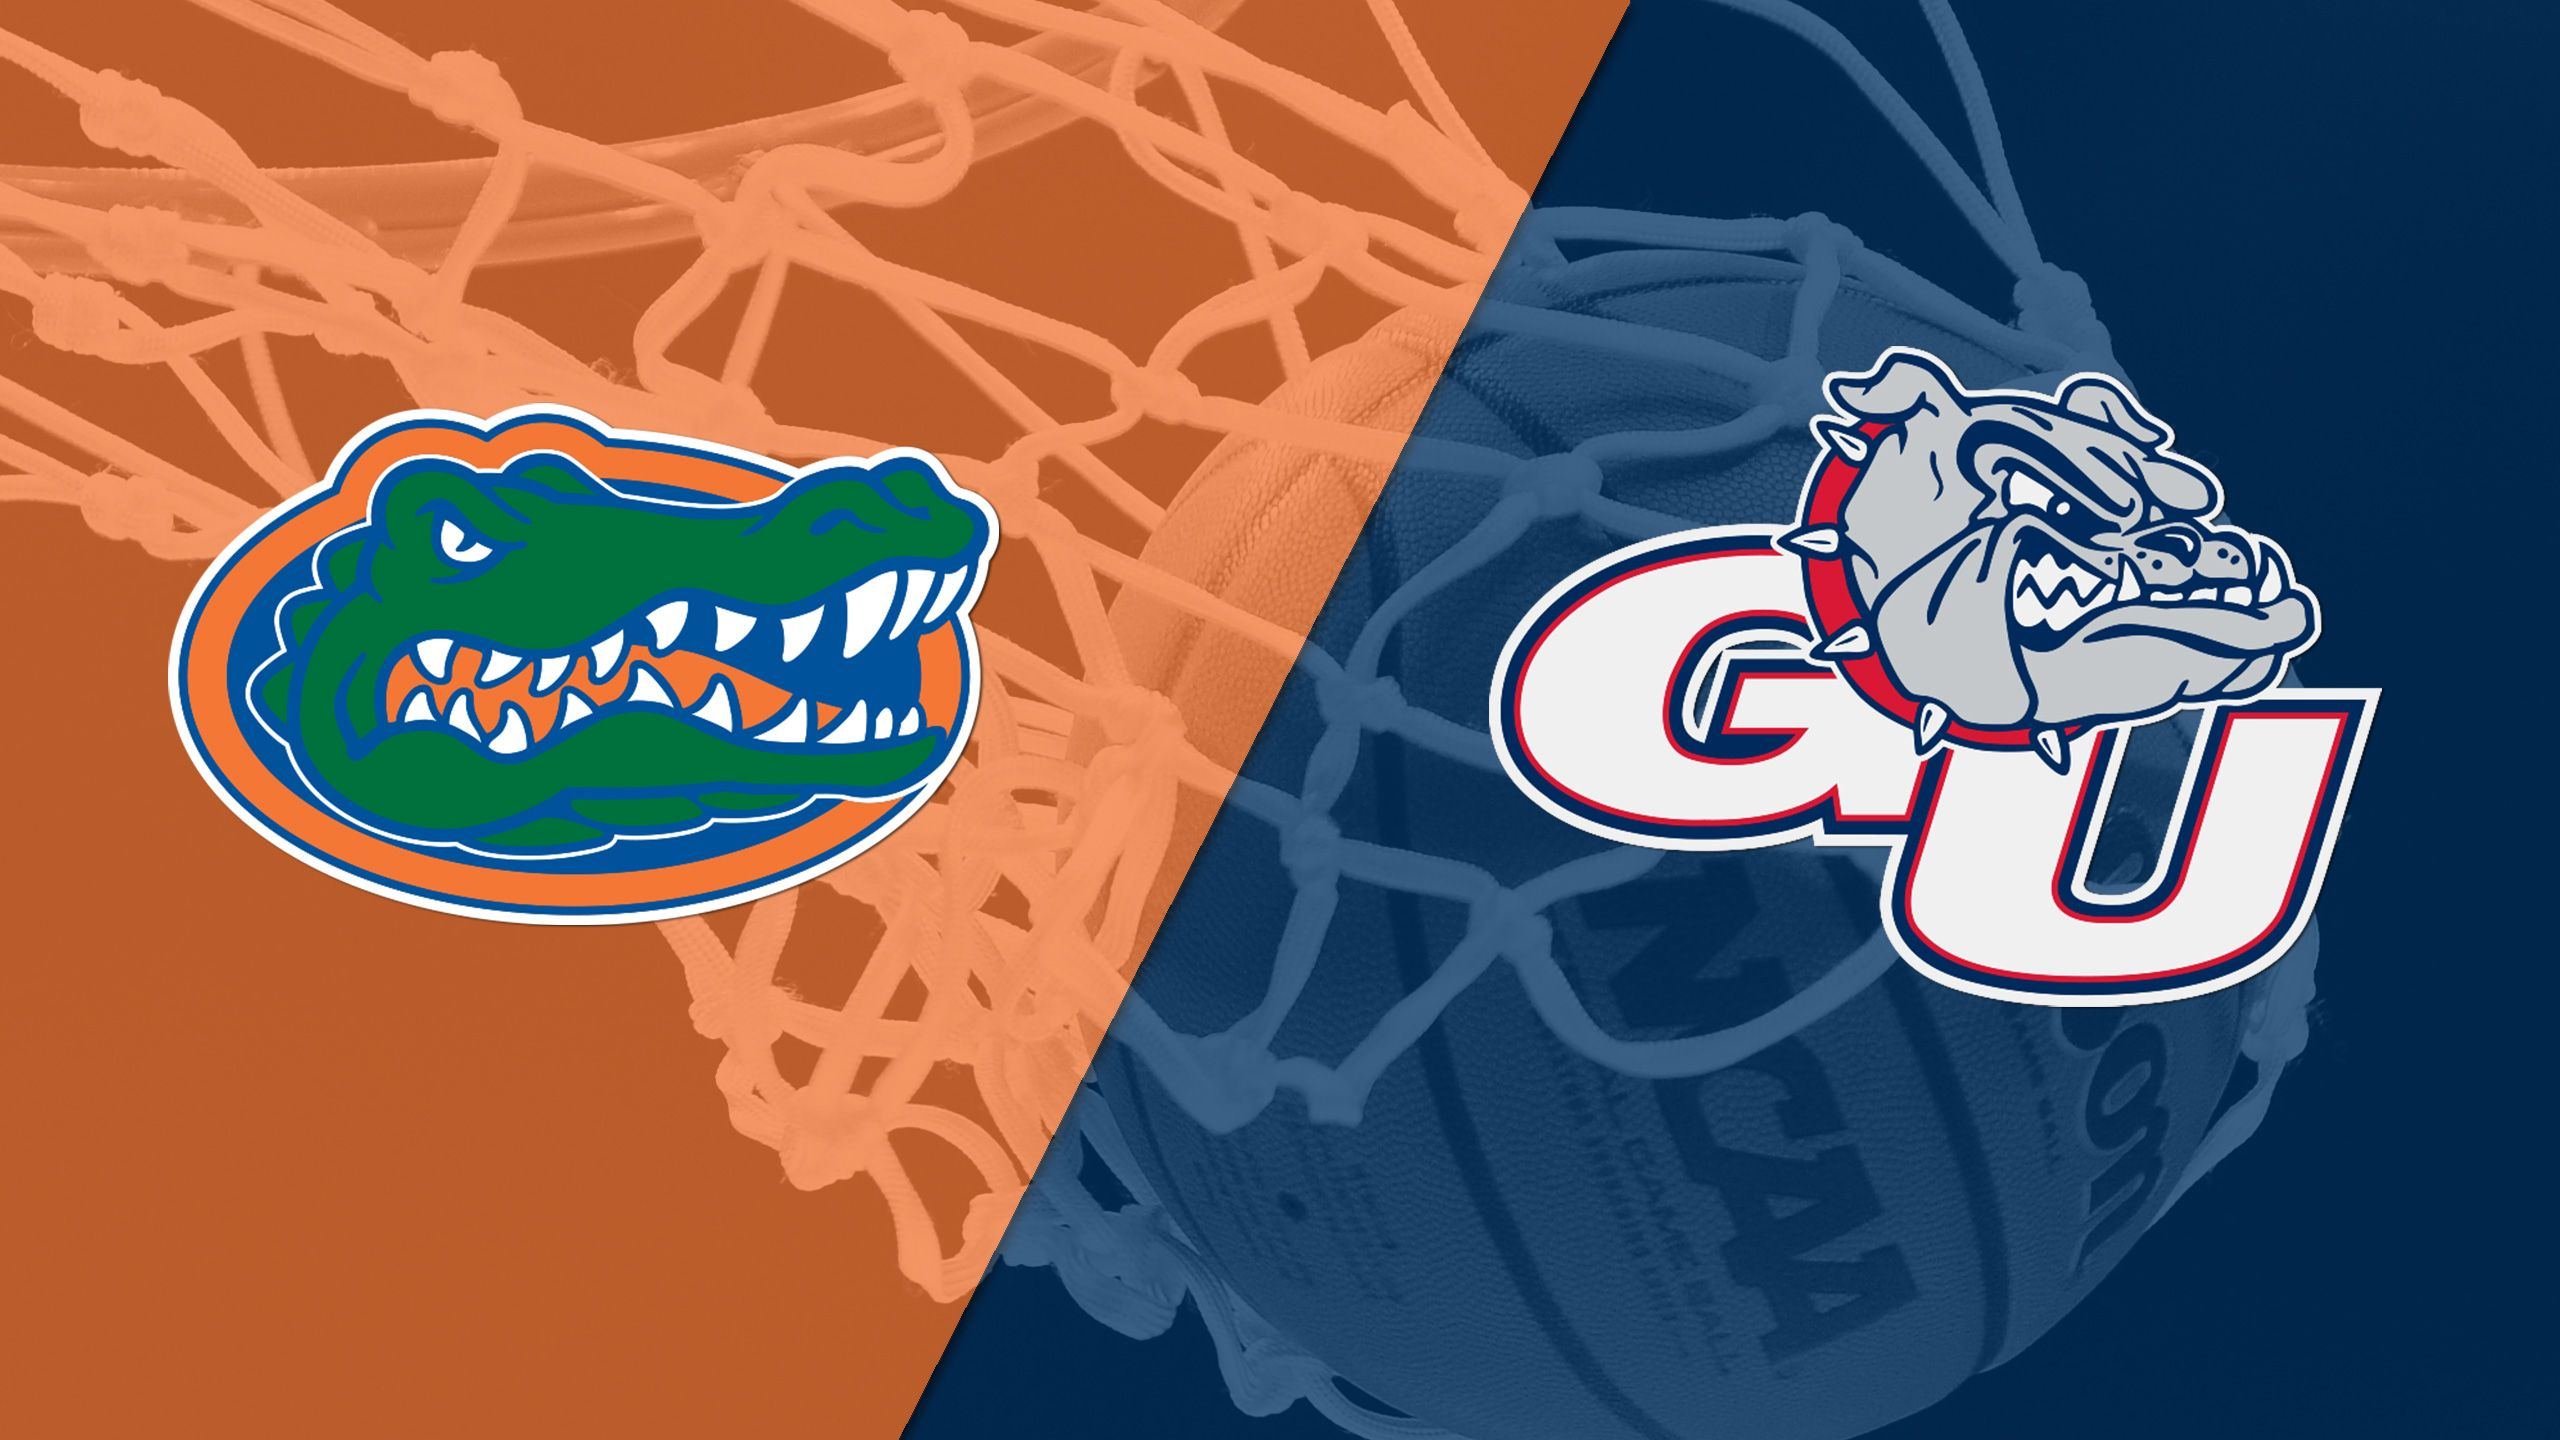 Above The Rim - #7 Florida vs. #17 Gonzaga (Semifinal #2) (PK80)